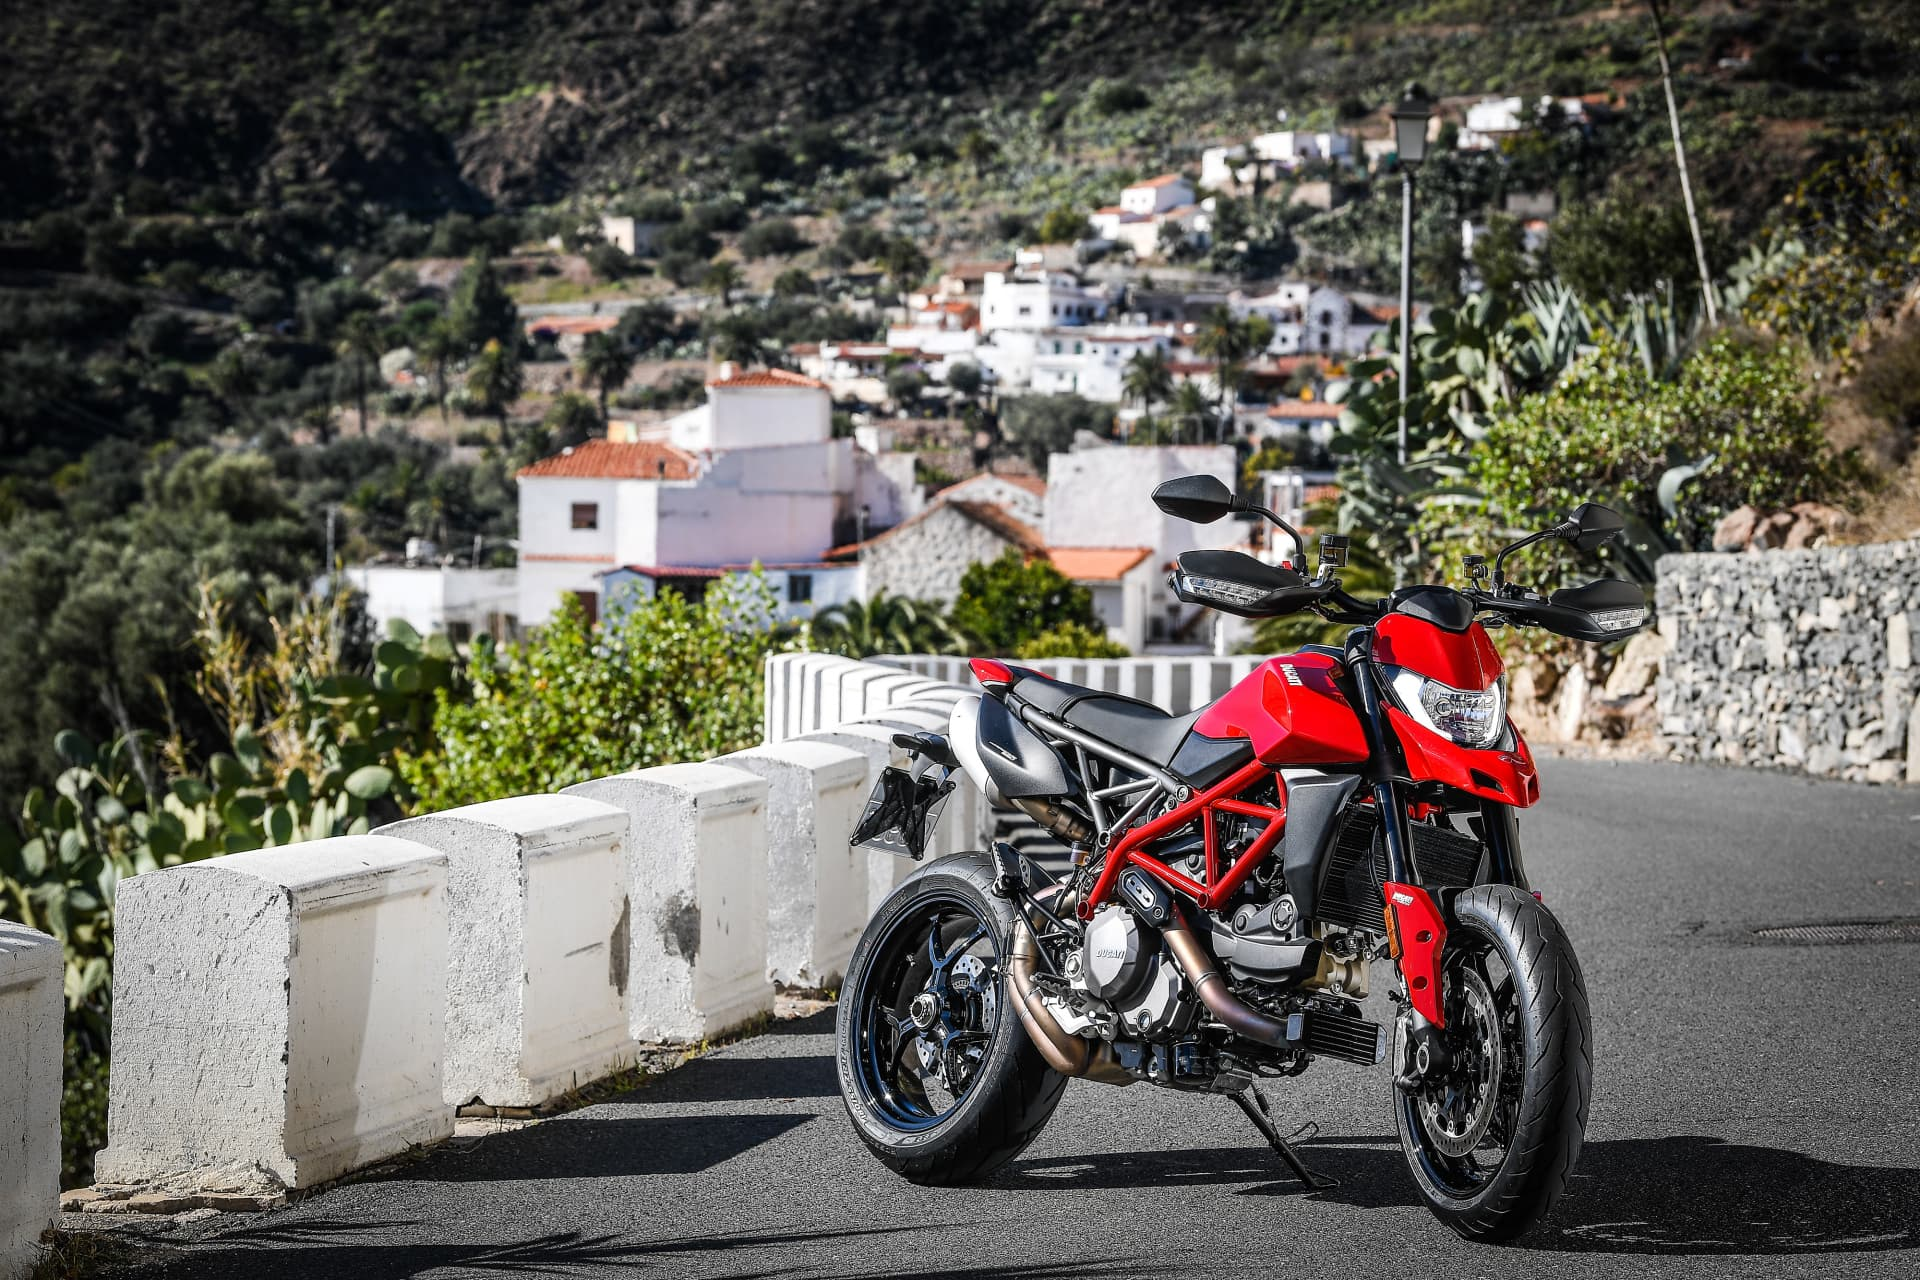 Ducati Hypermotard 950 Static 09 Uc70272 Mid